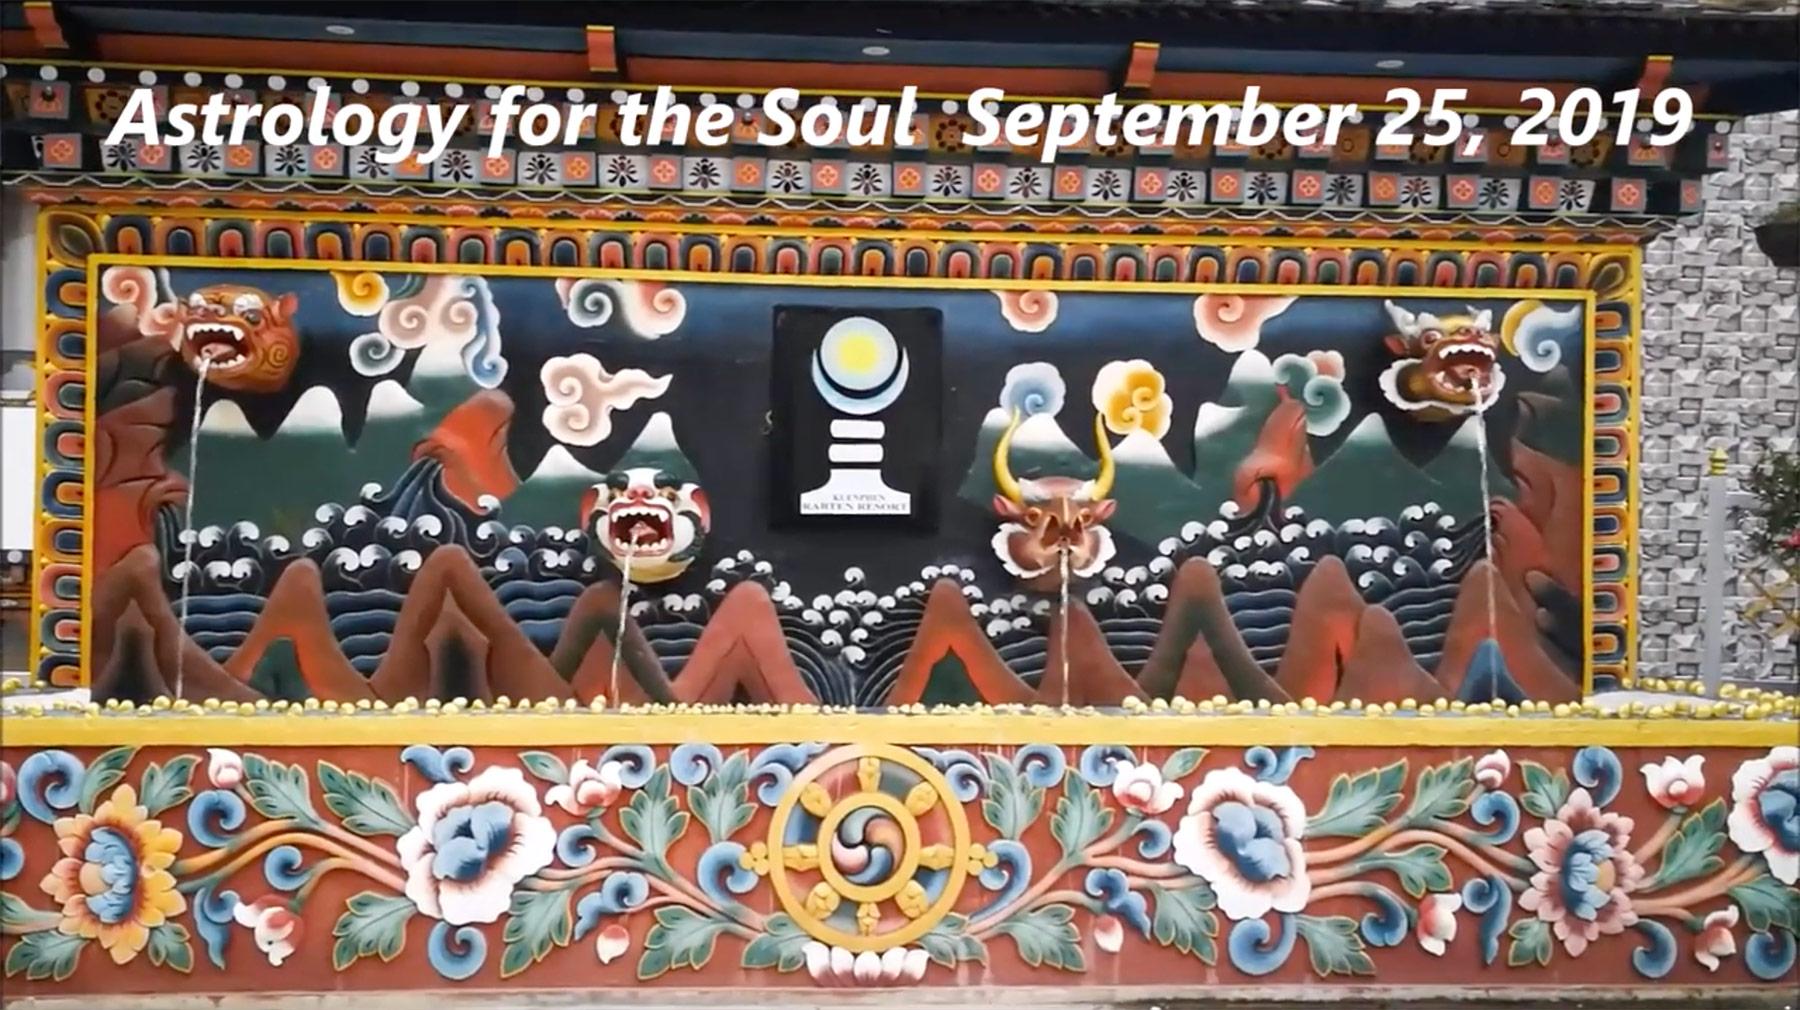 Sept 25th, 2019 – Pele Report, Astrology Forecast